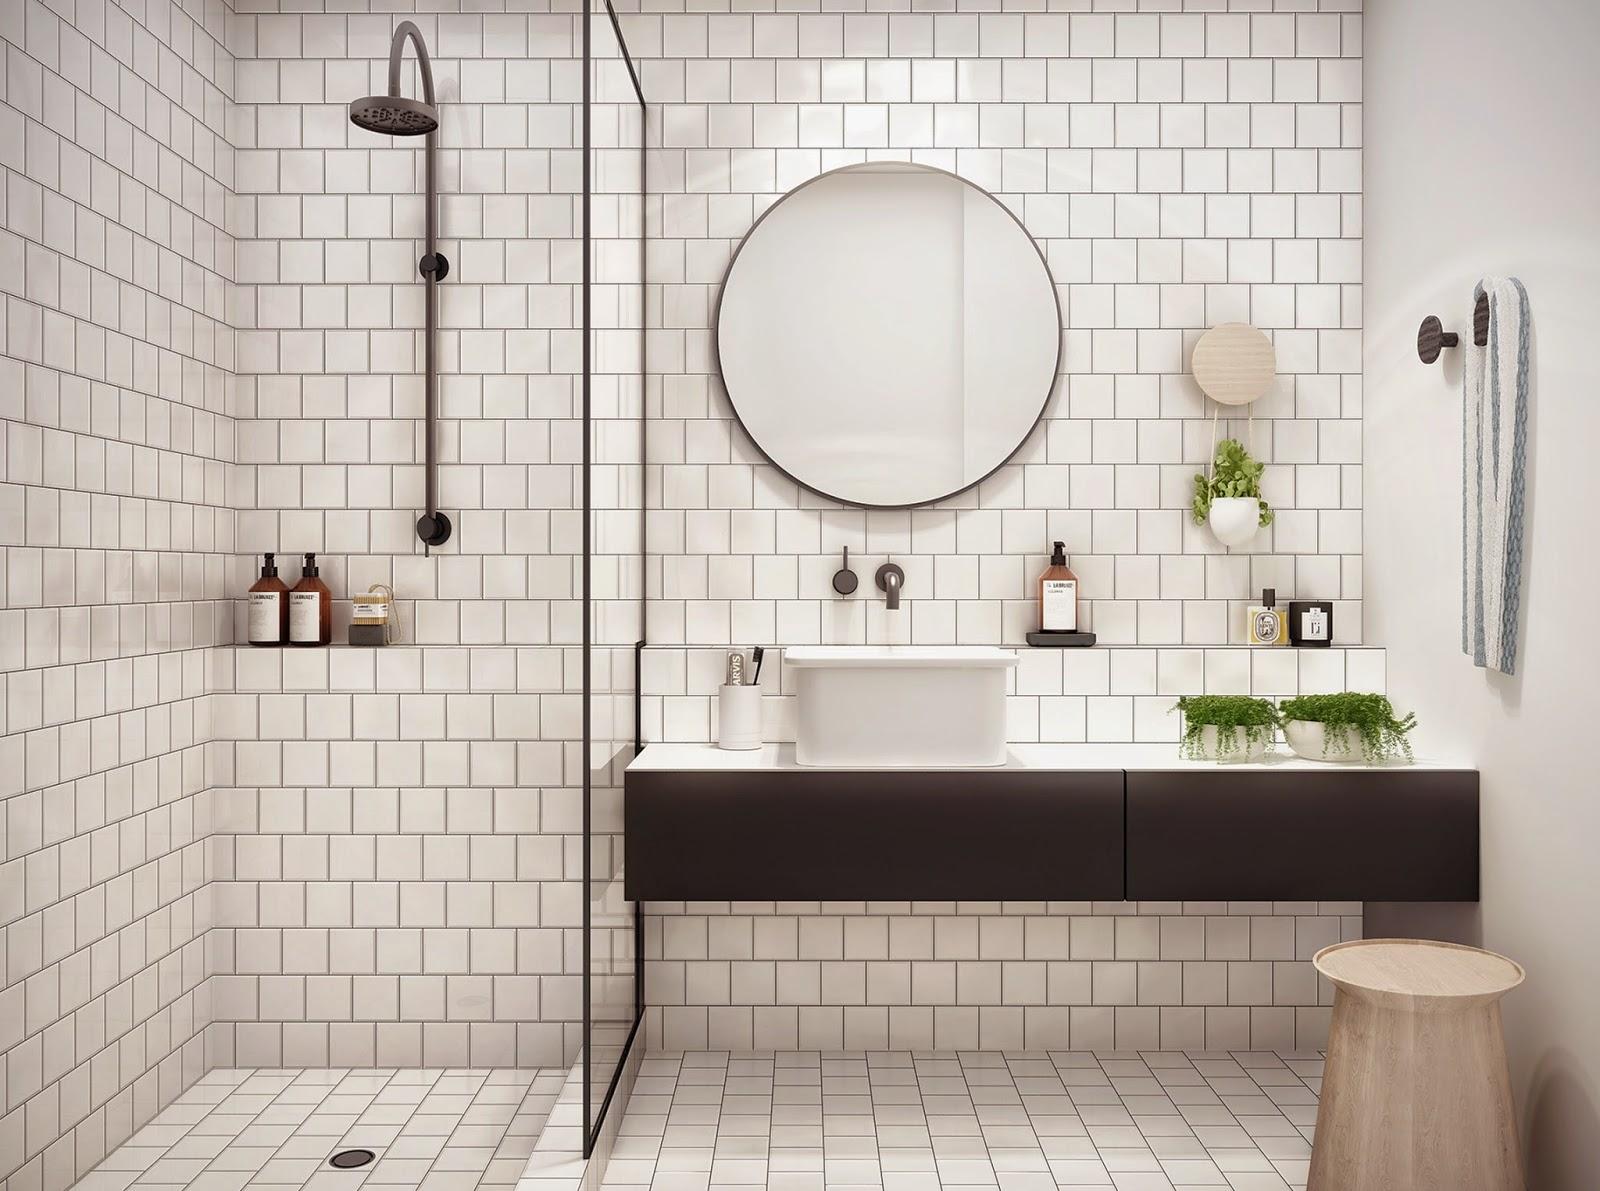 Petite salle de bain avec baignoire dangle - Optimiser une petite salle de bain ...